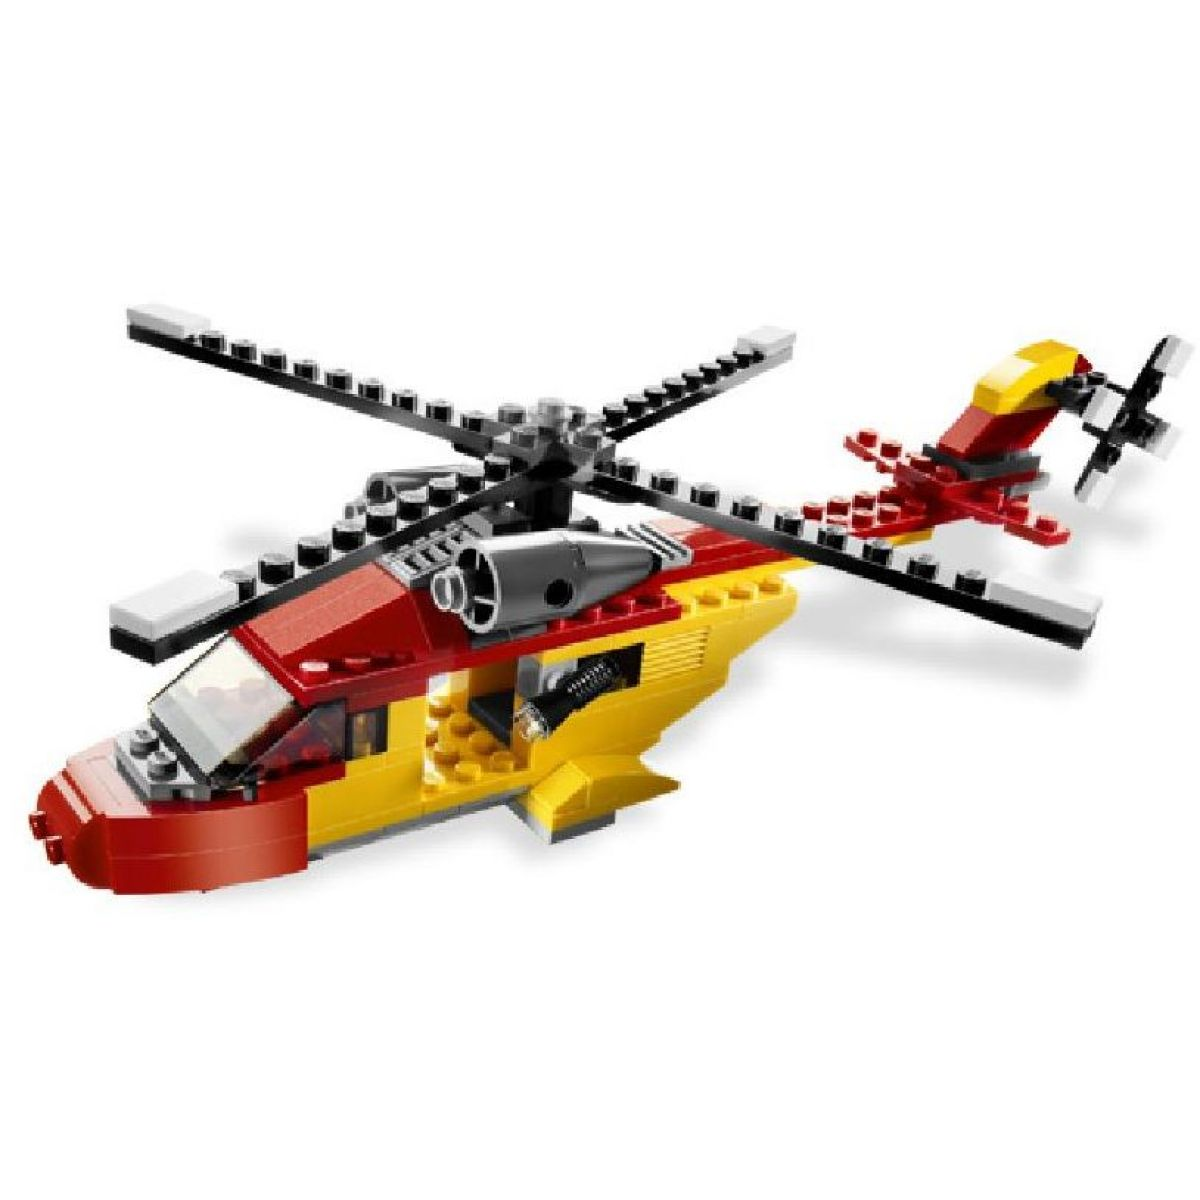 LEGO CREATOR 5866 Záchrana ze vzduchu